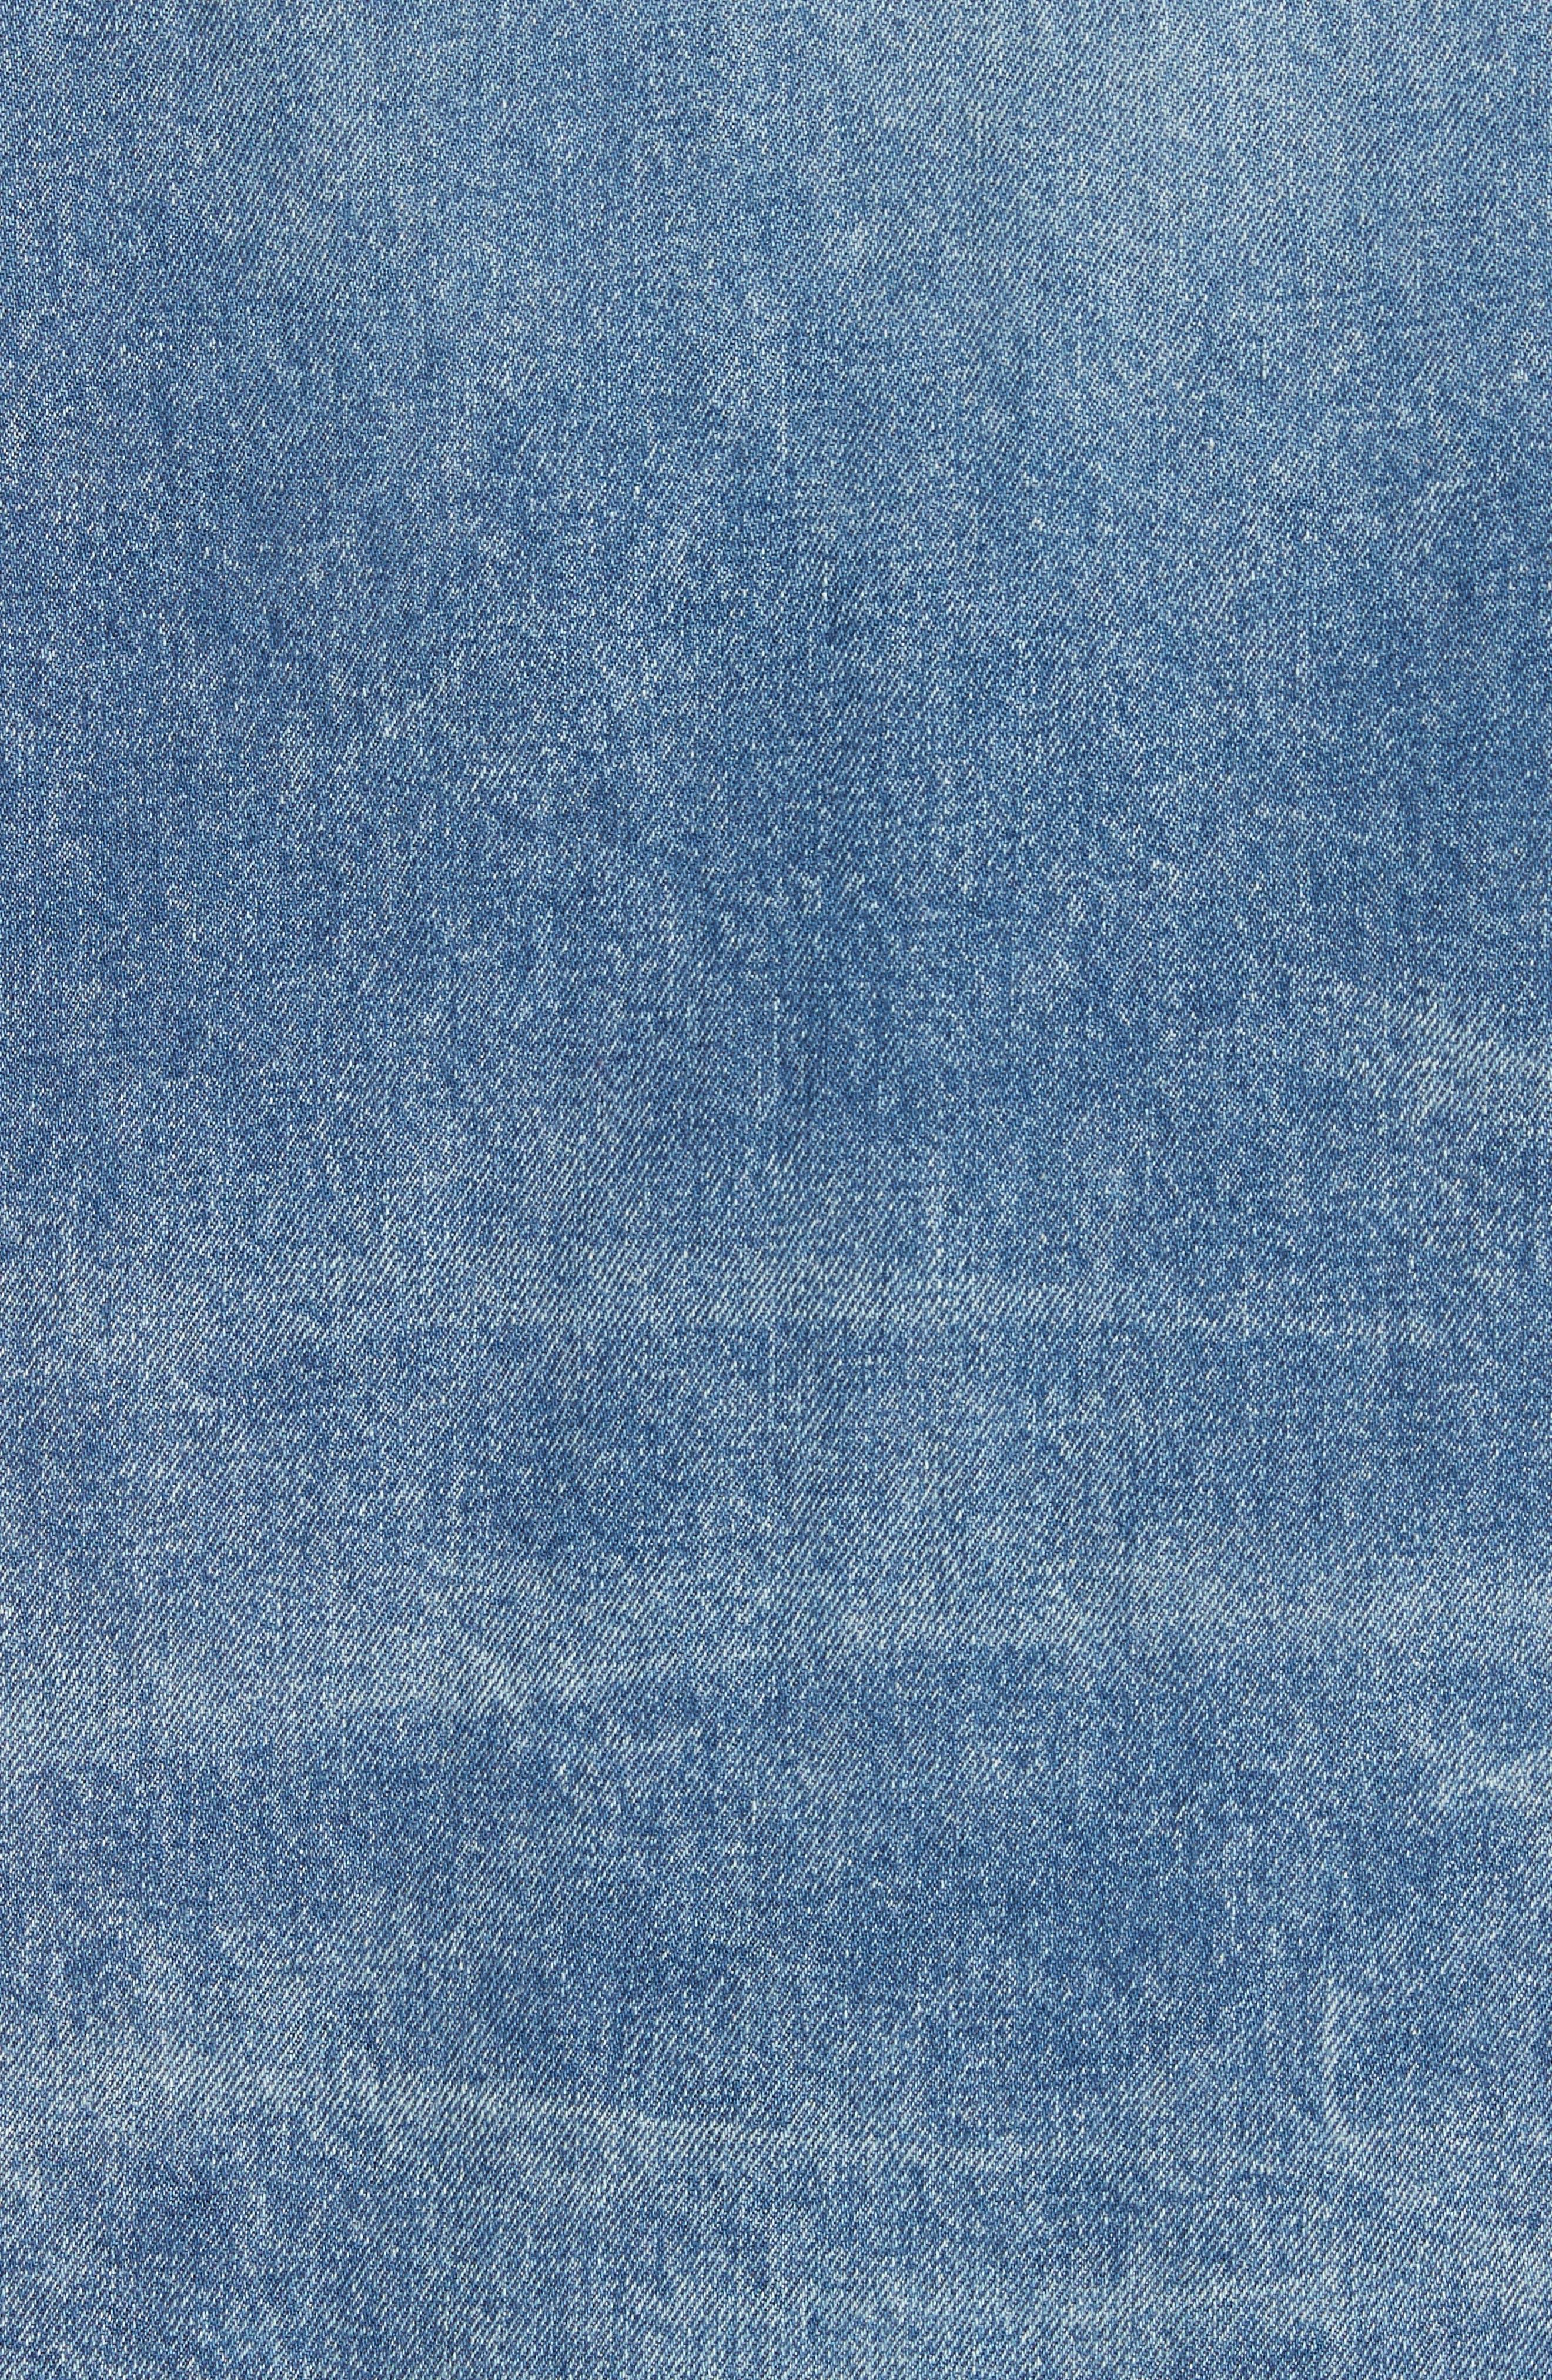 Oversized Cutoff Denim Jacket,                             Alternate thumbnail 6, color,                             400